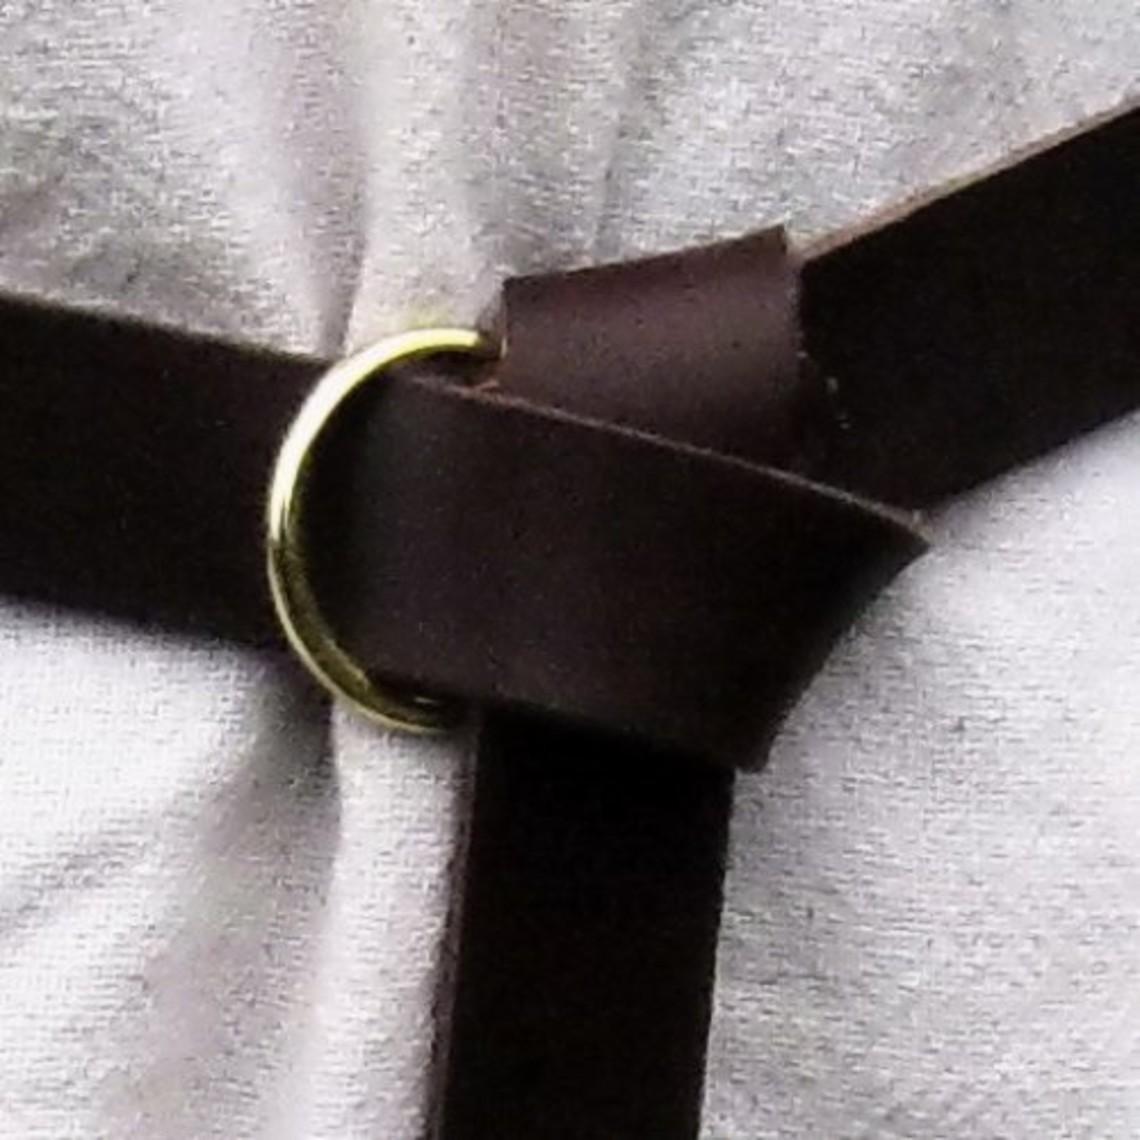 anneau de ceinture en cuir 4 cm, cuir fendu brun